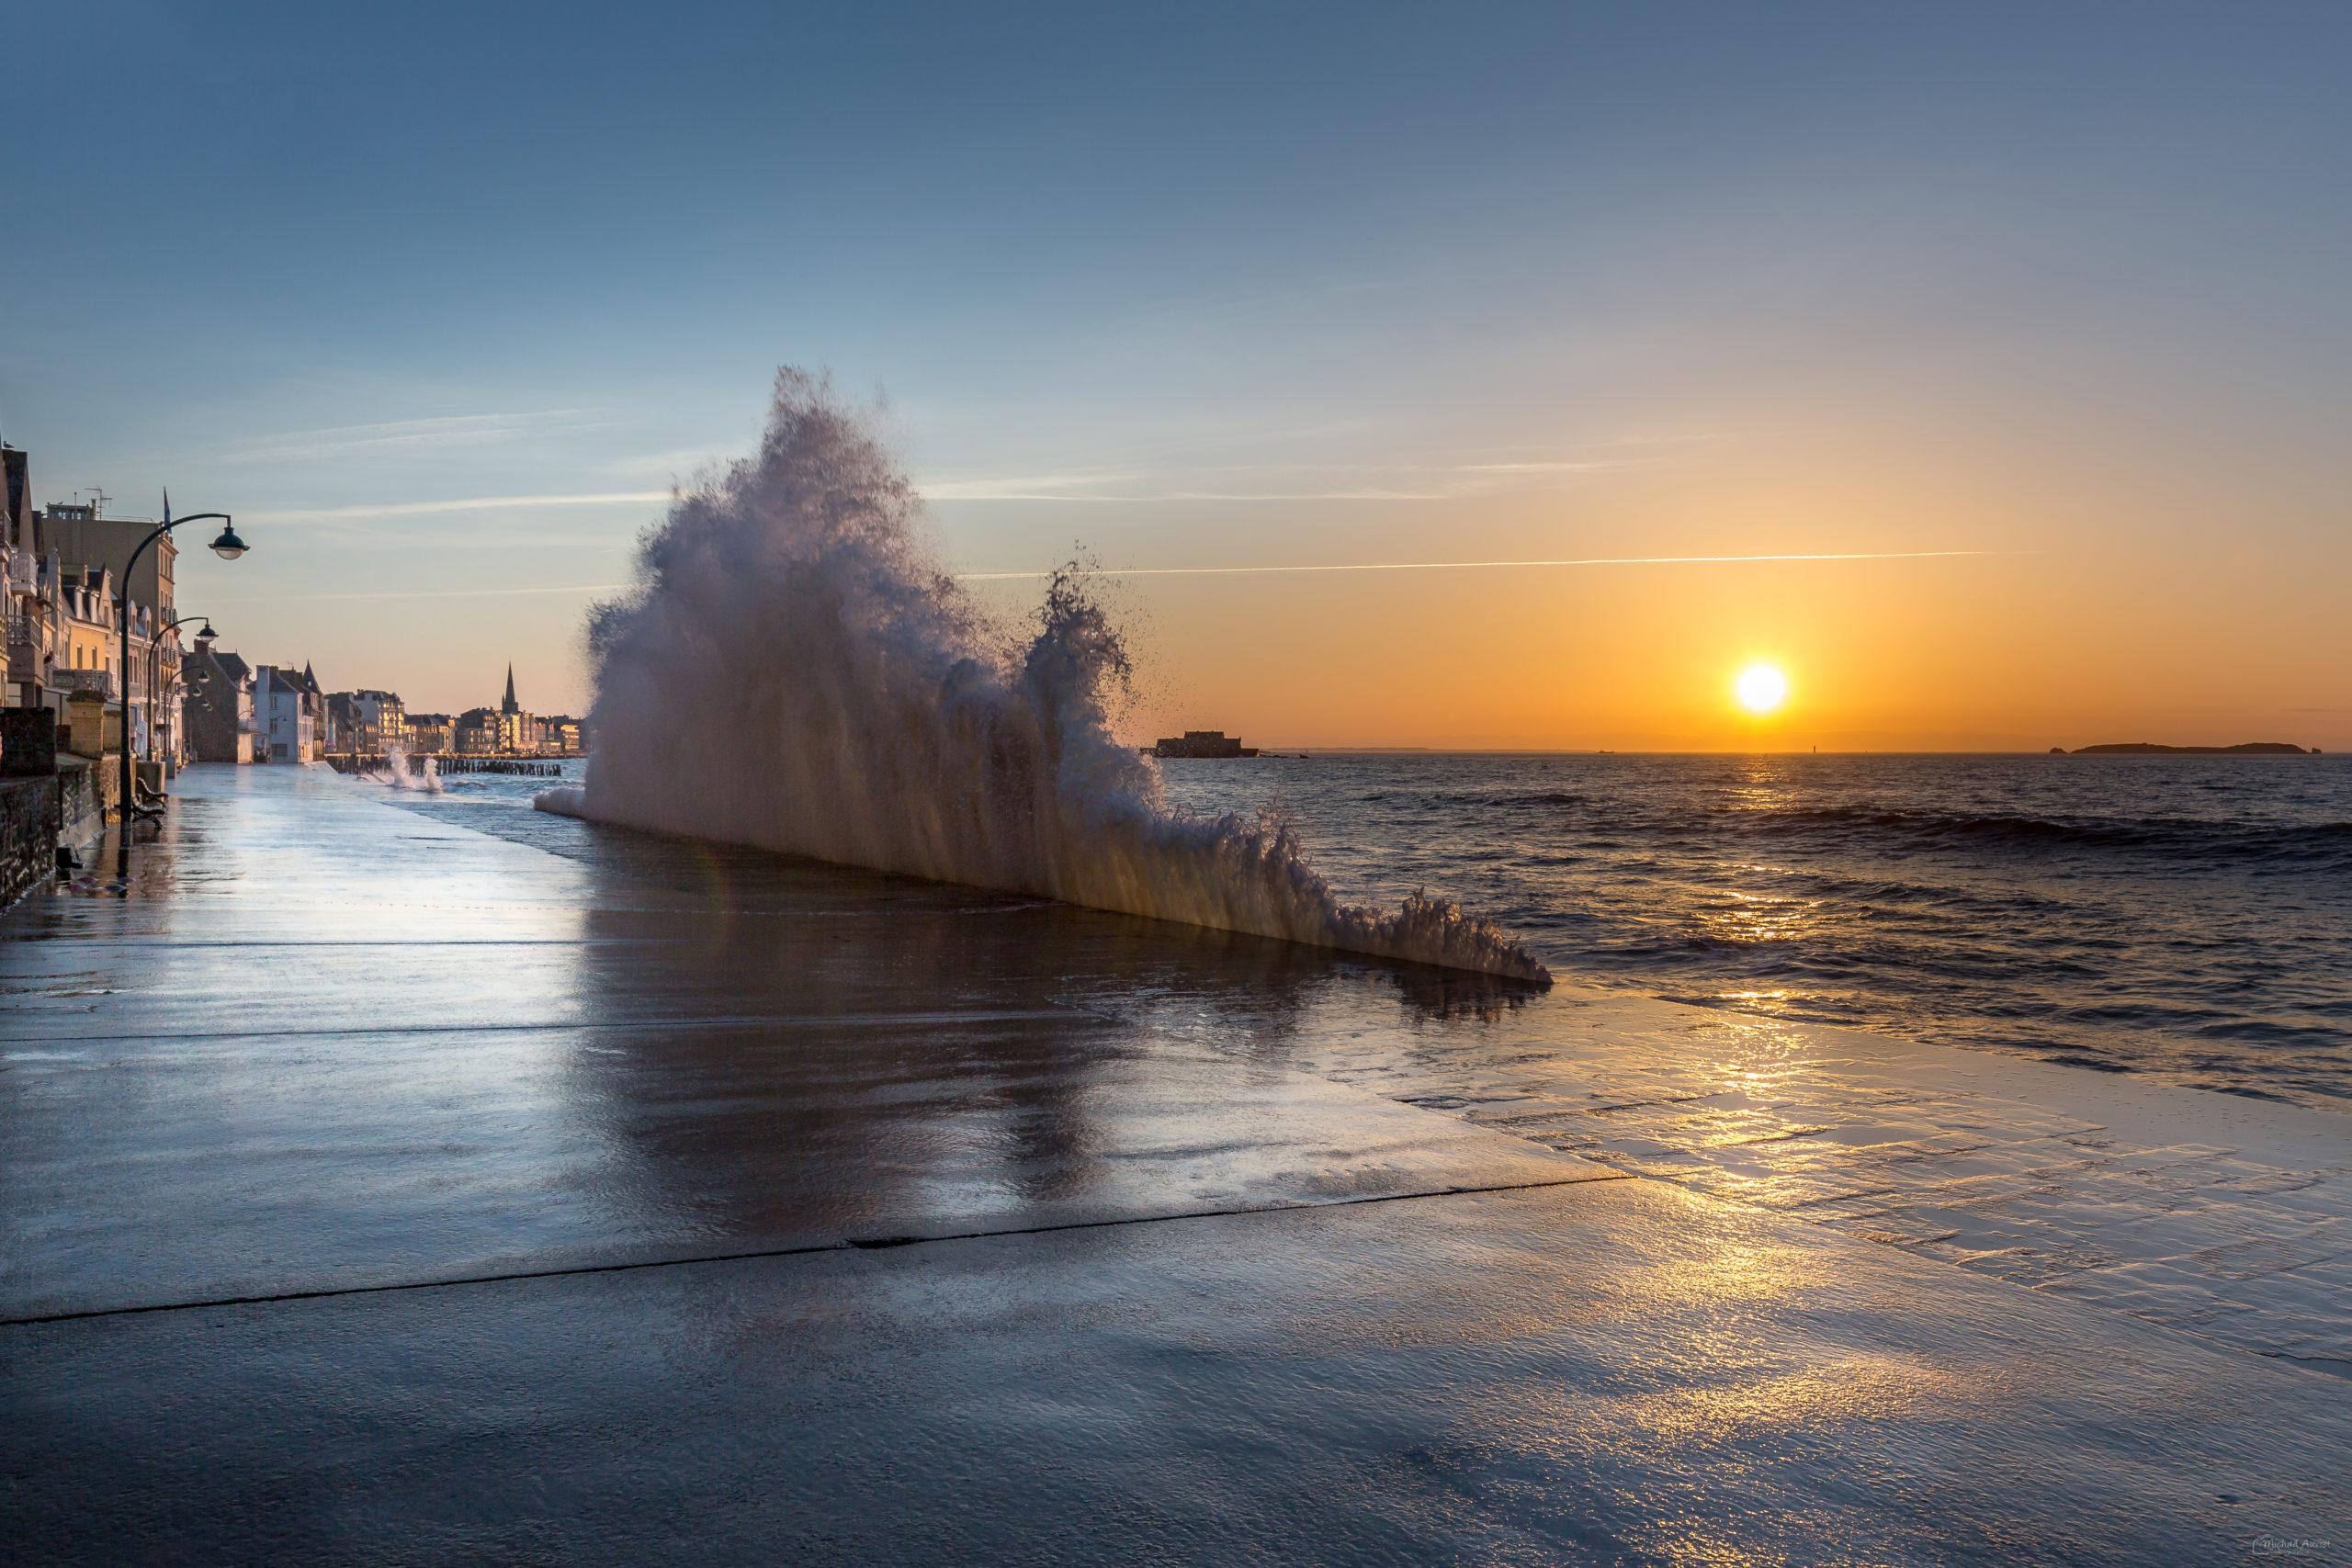 grandes-marees saint-malo sillon sunset